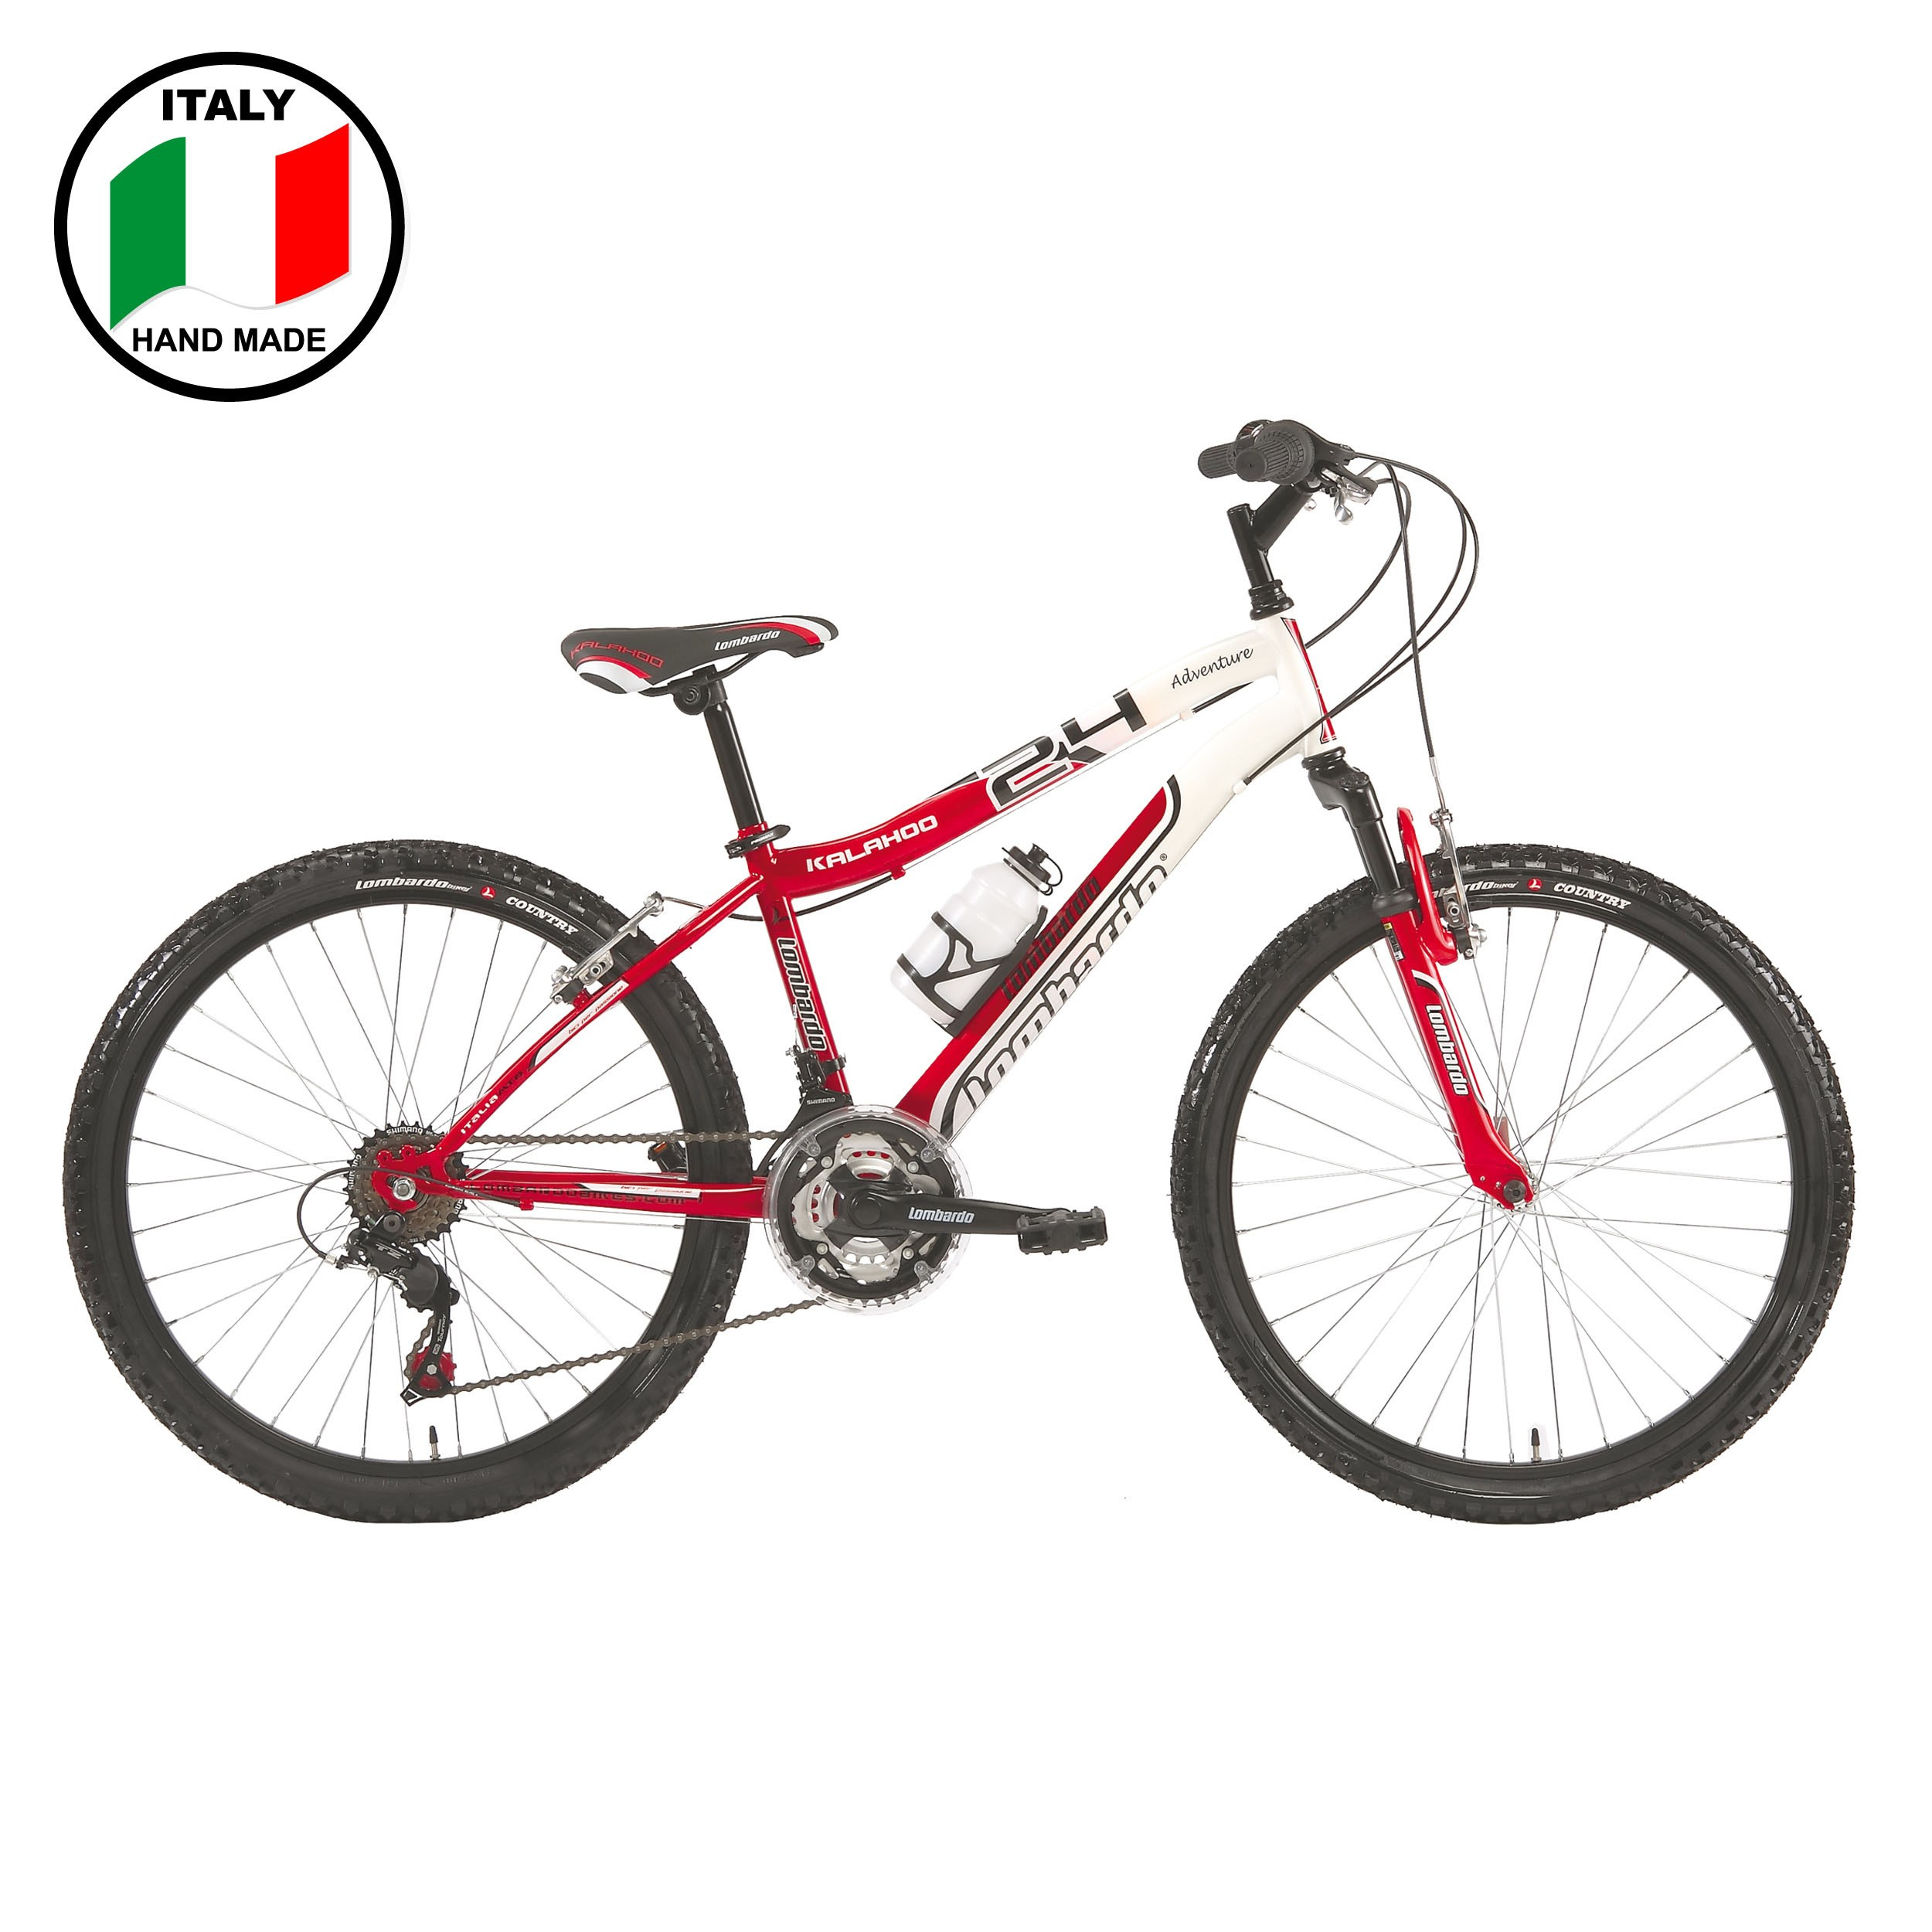 Lombardo Kalahoo  24 inch Men's Bike- Red and White